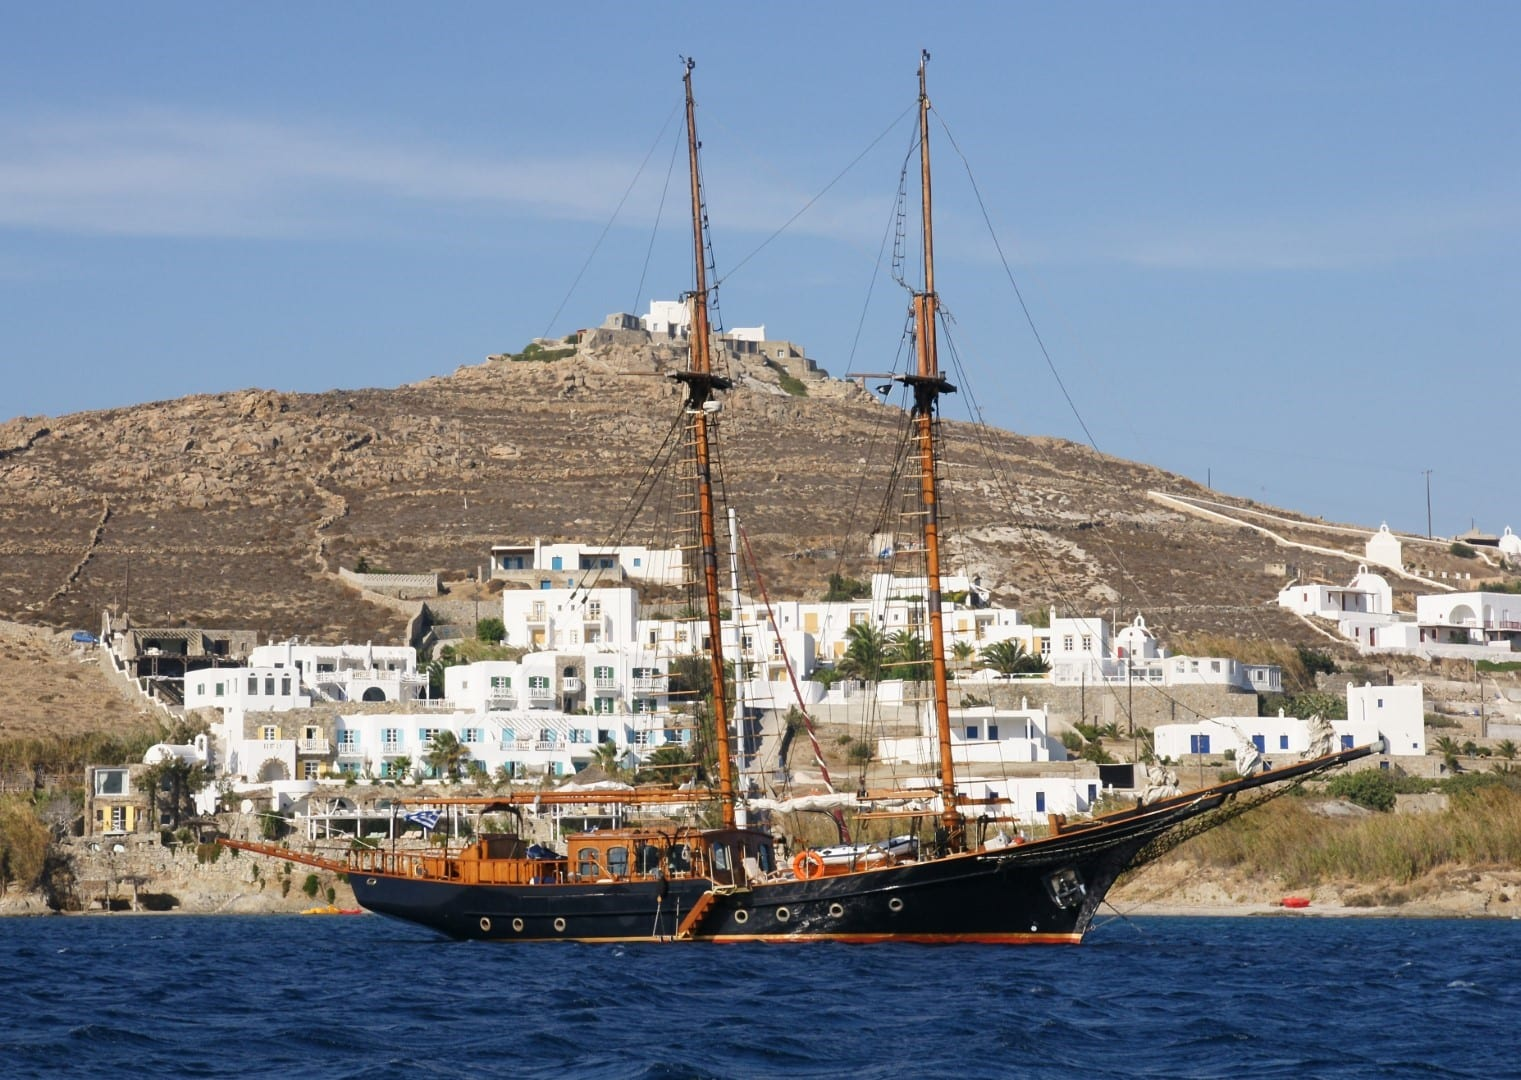 prince motor sailer profile (3) -  Valef Yachts Chartering - 0894